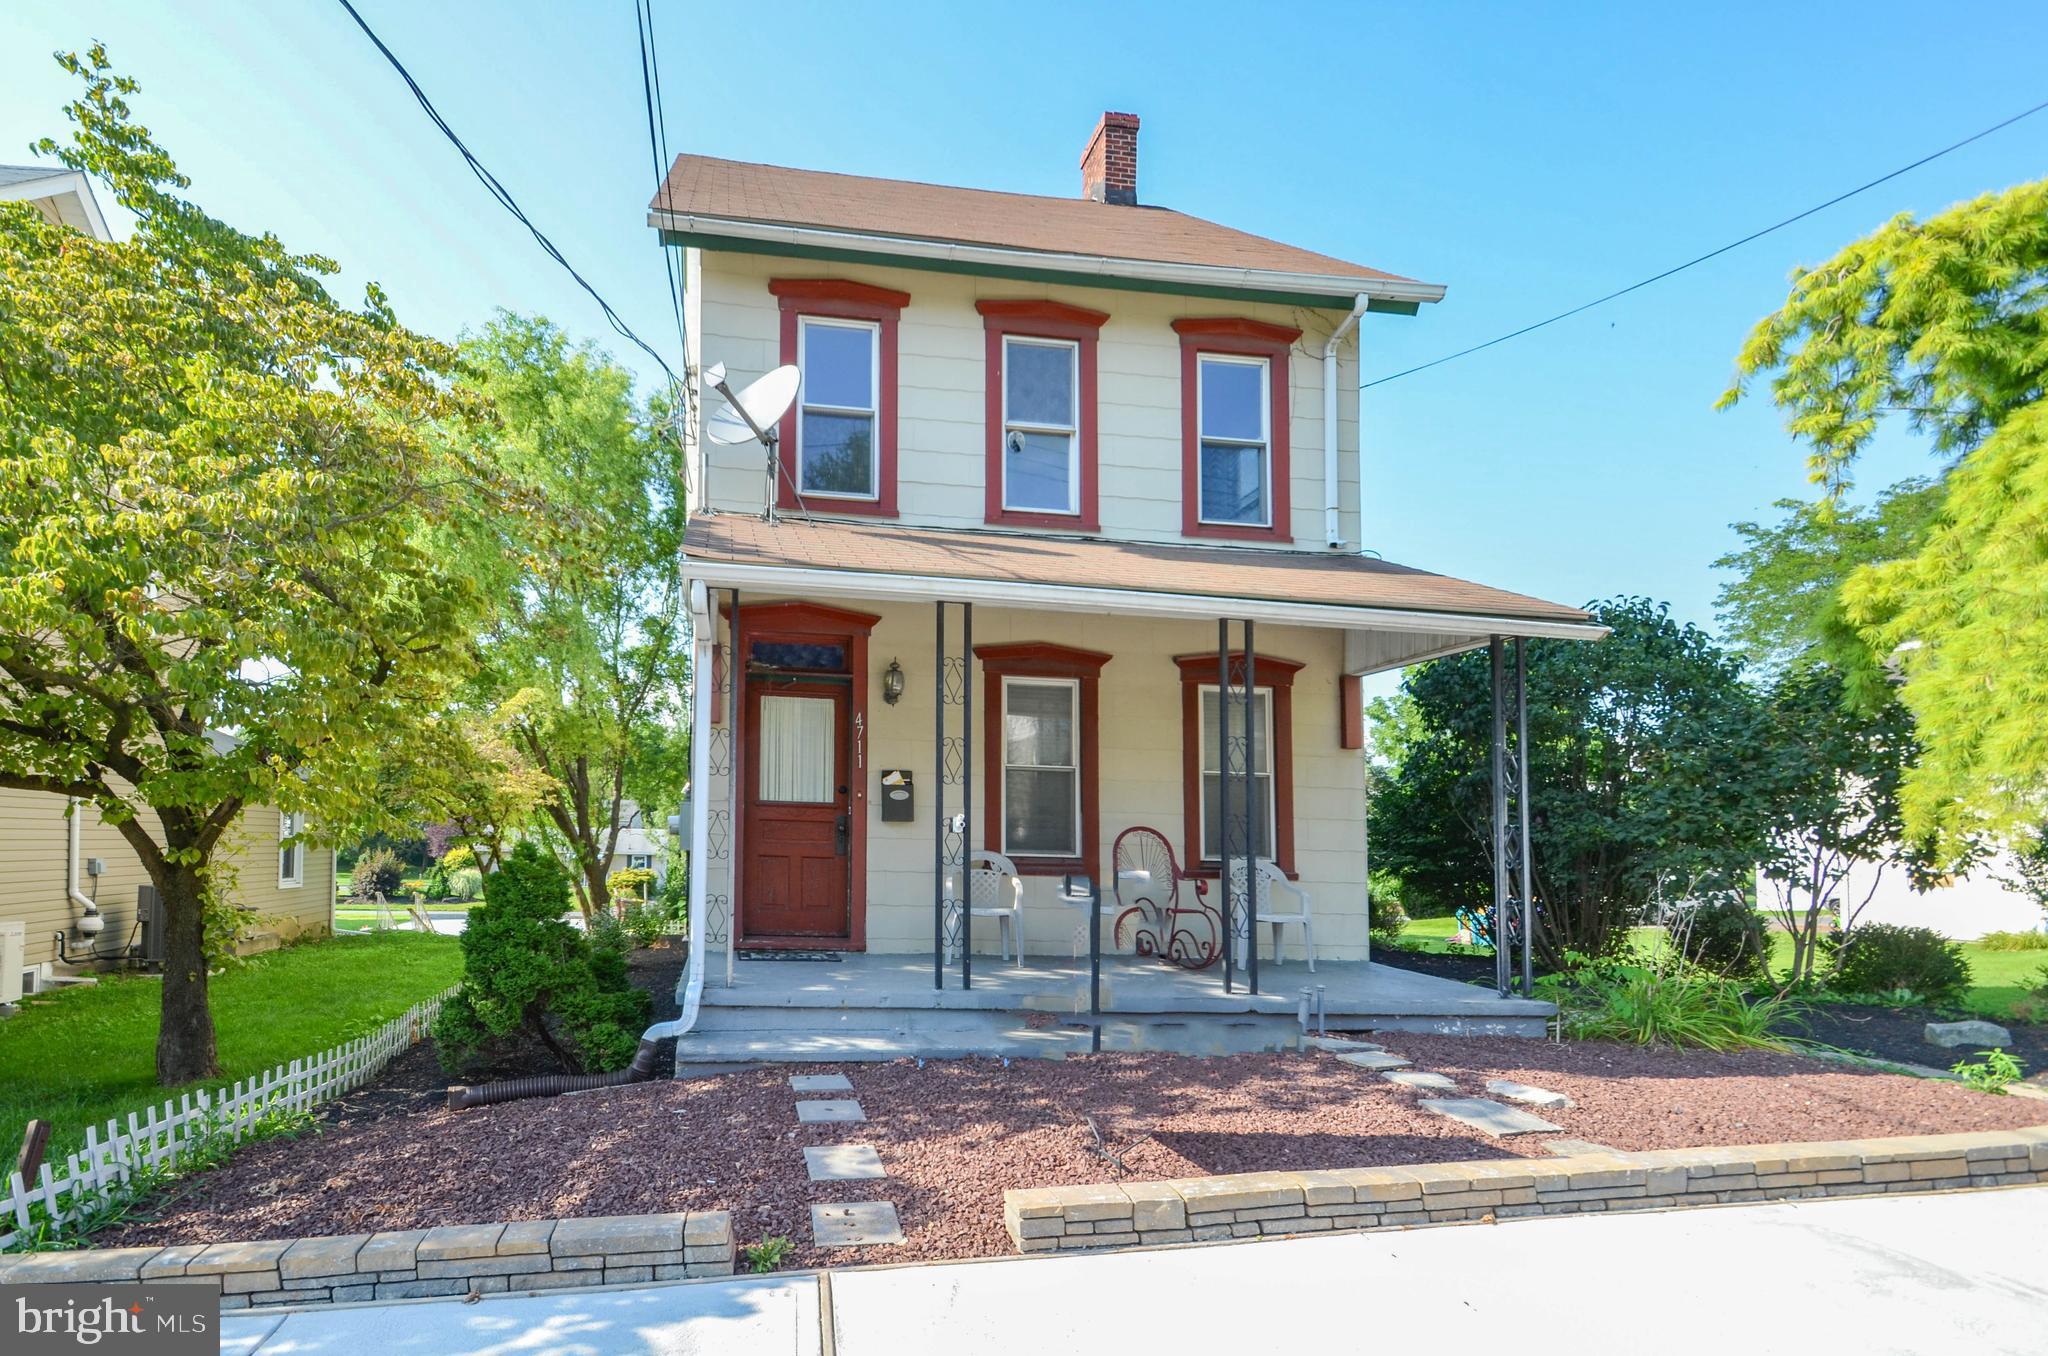 4711 MAIN STREET, WHITEHALL, PA 18052